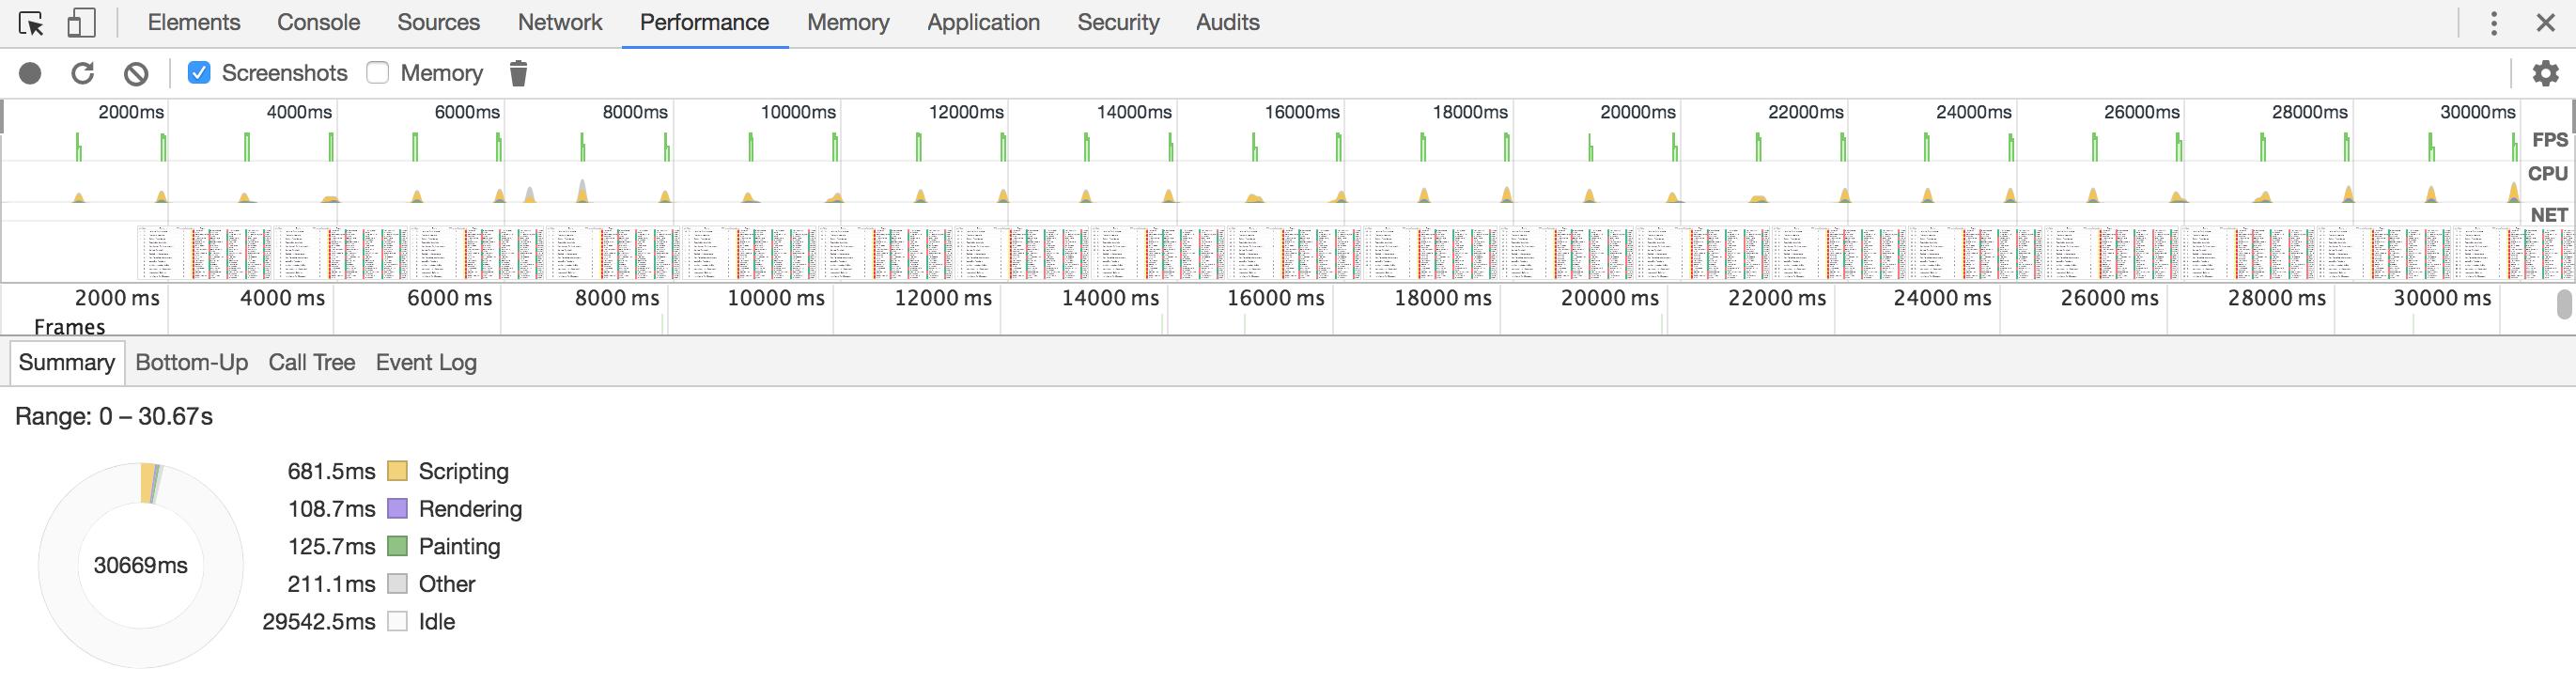 Vue.js Results